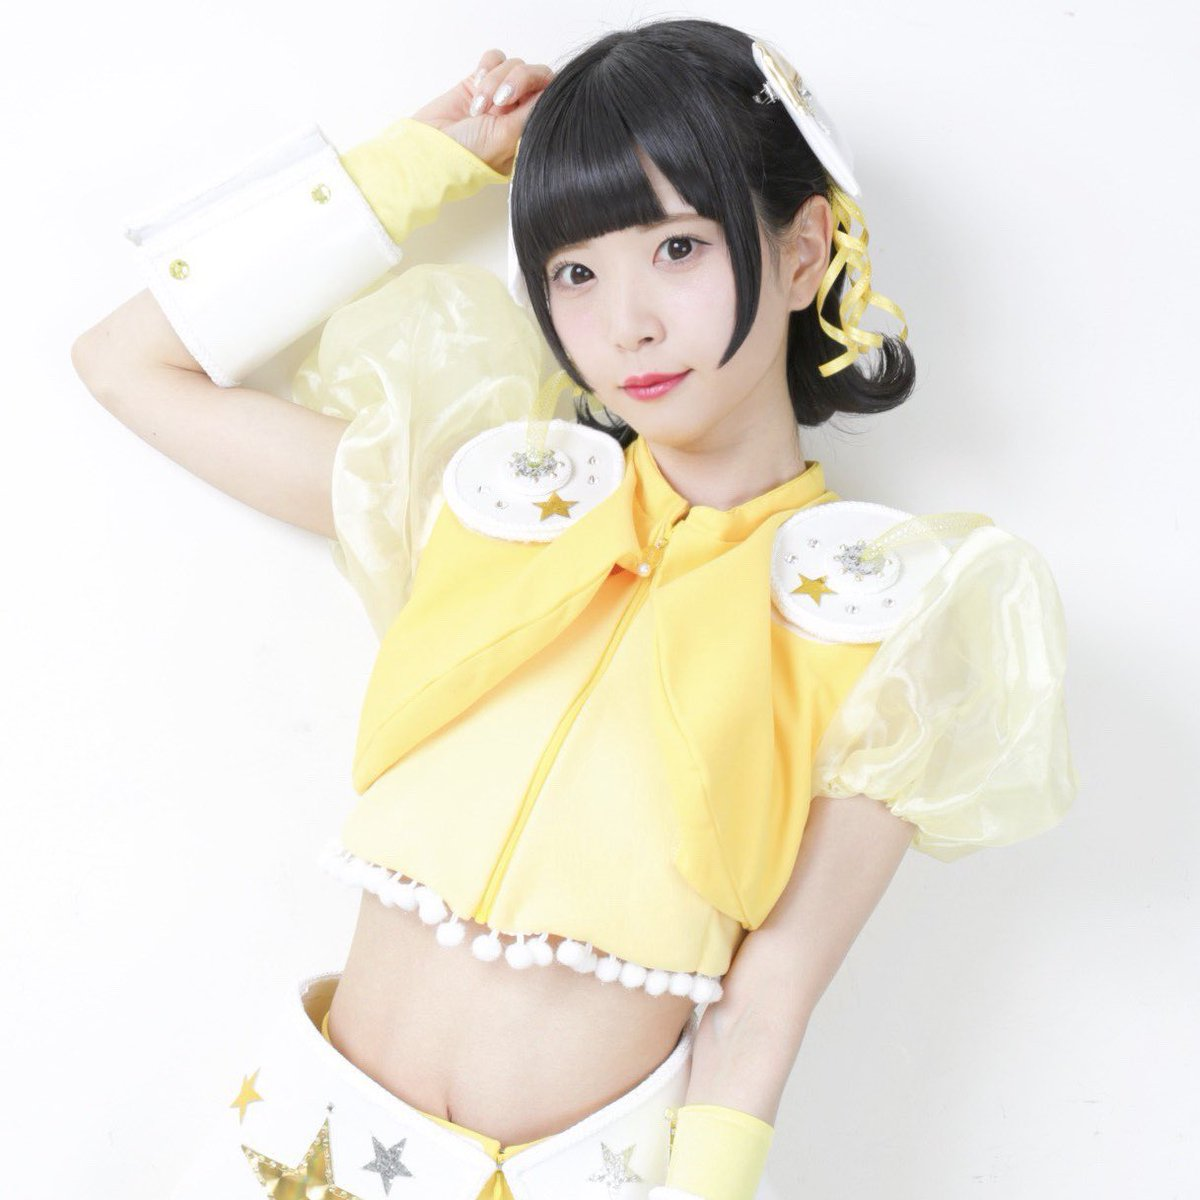 Koinumaru Pochi Discography Featured In